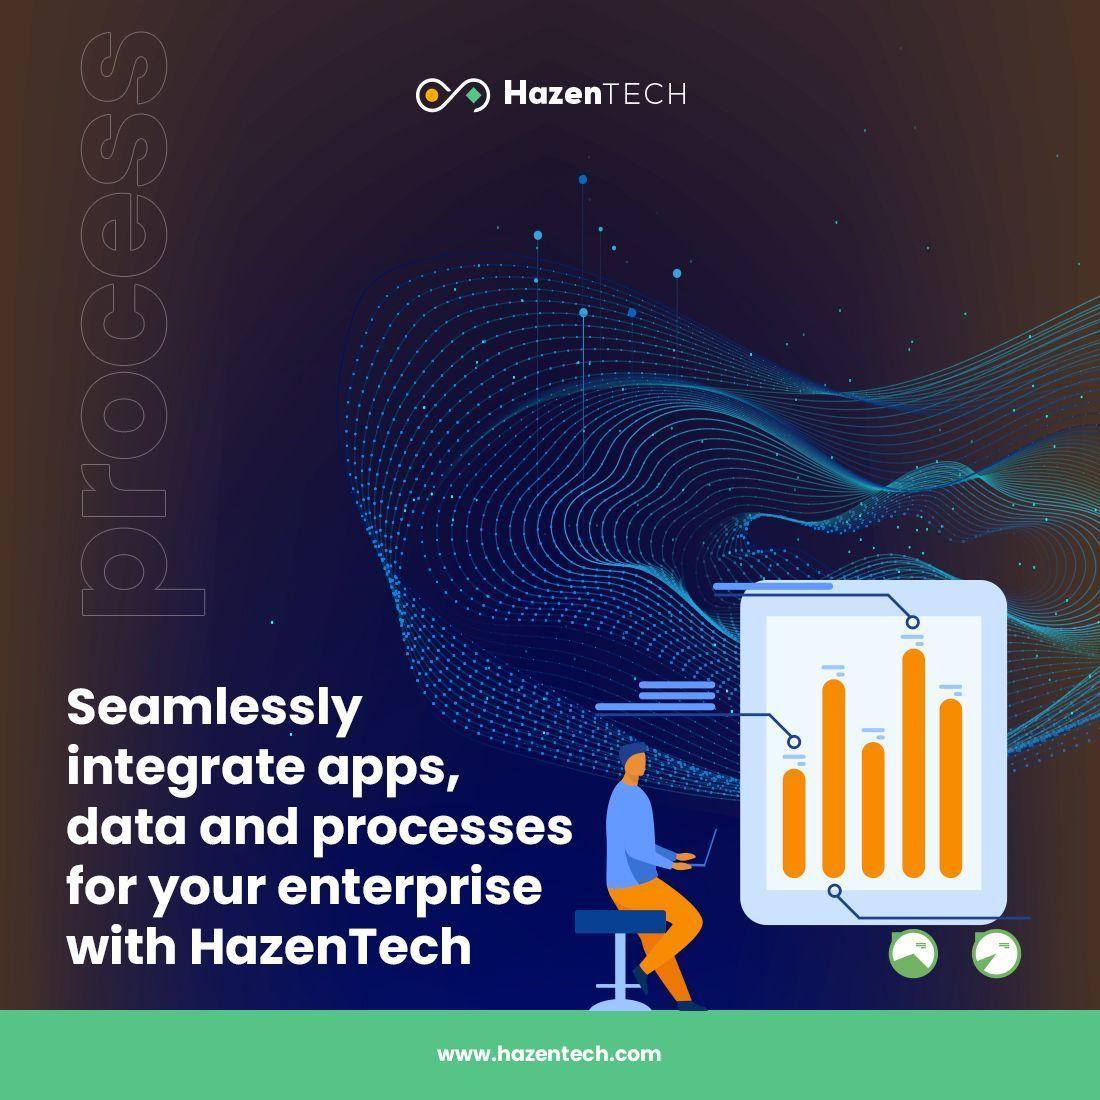 Hazentech Plays A Crucial Role In Providing Enterprise Application Integration Services A Enterprise Application Integration Enterprise Application Enterprise